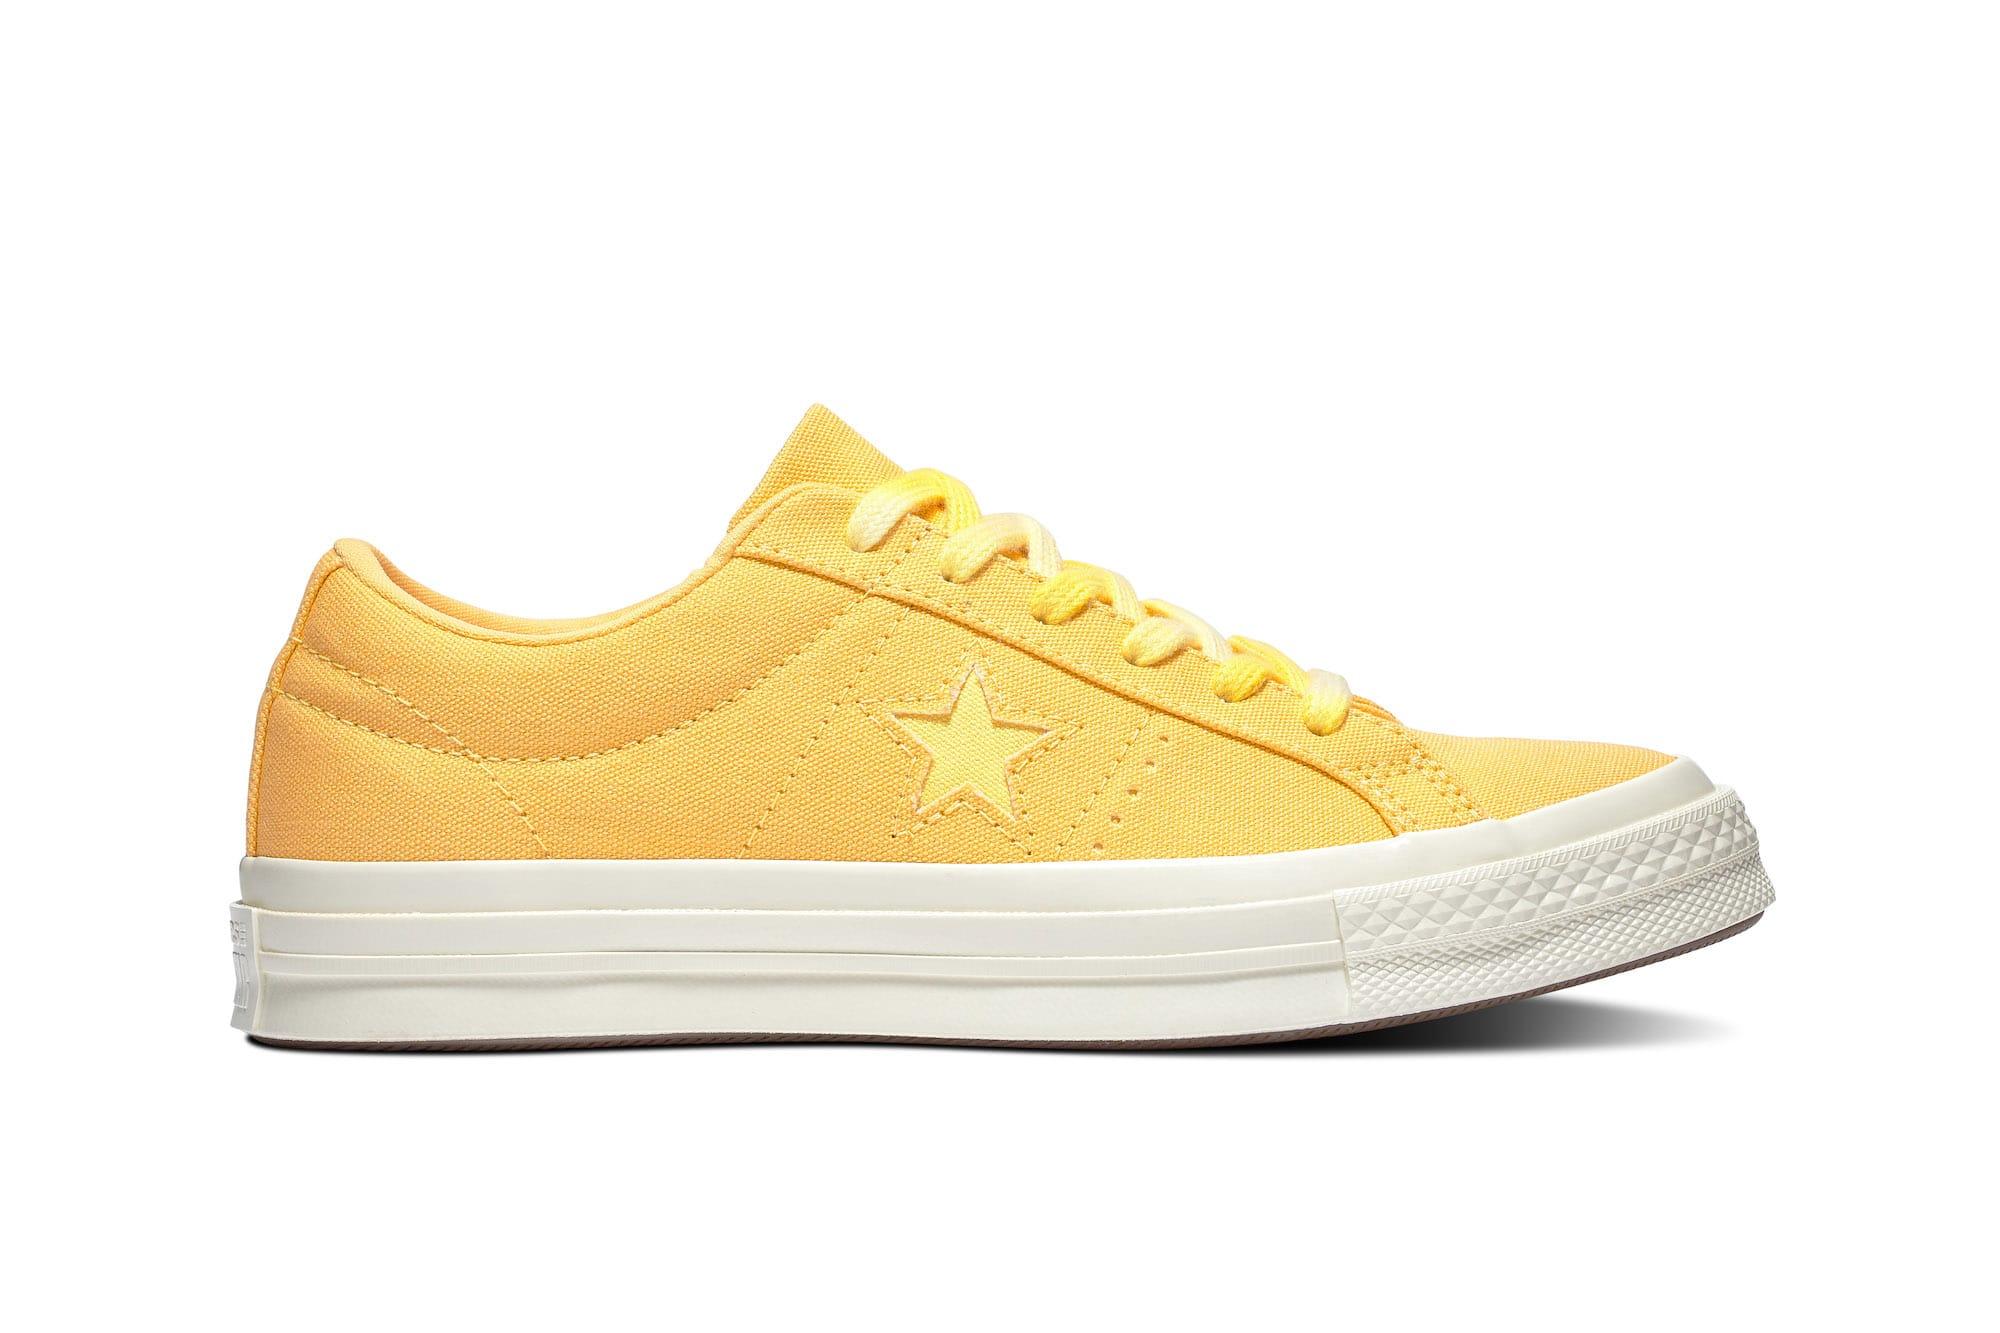 Converse One Star Spring/Summer